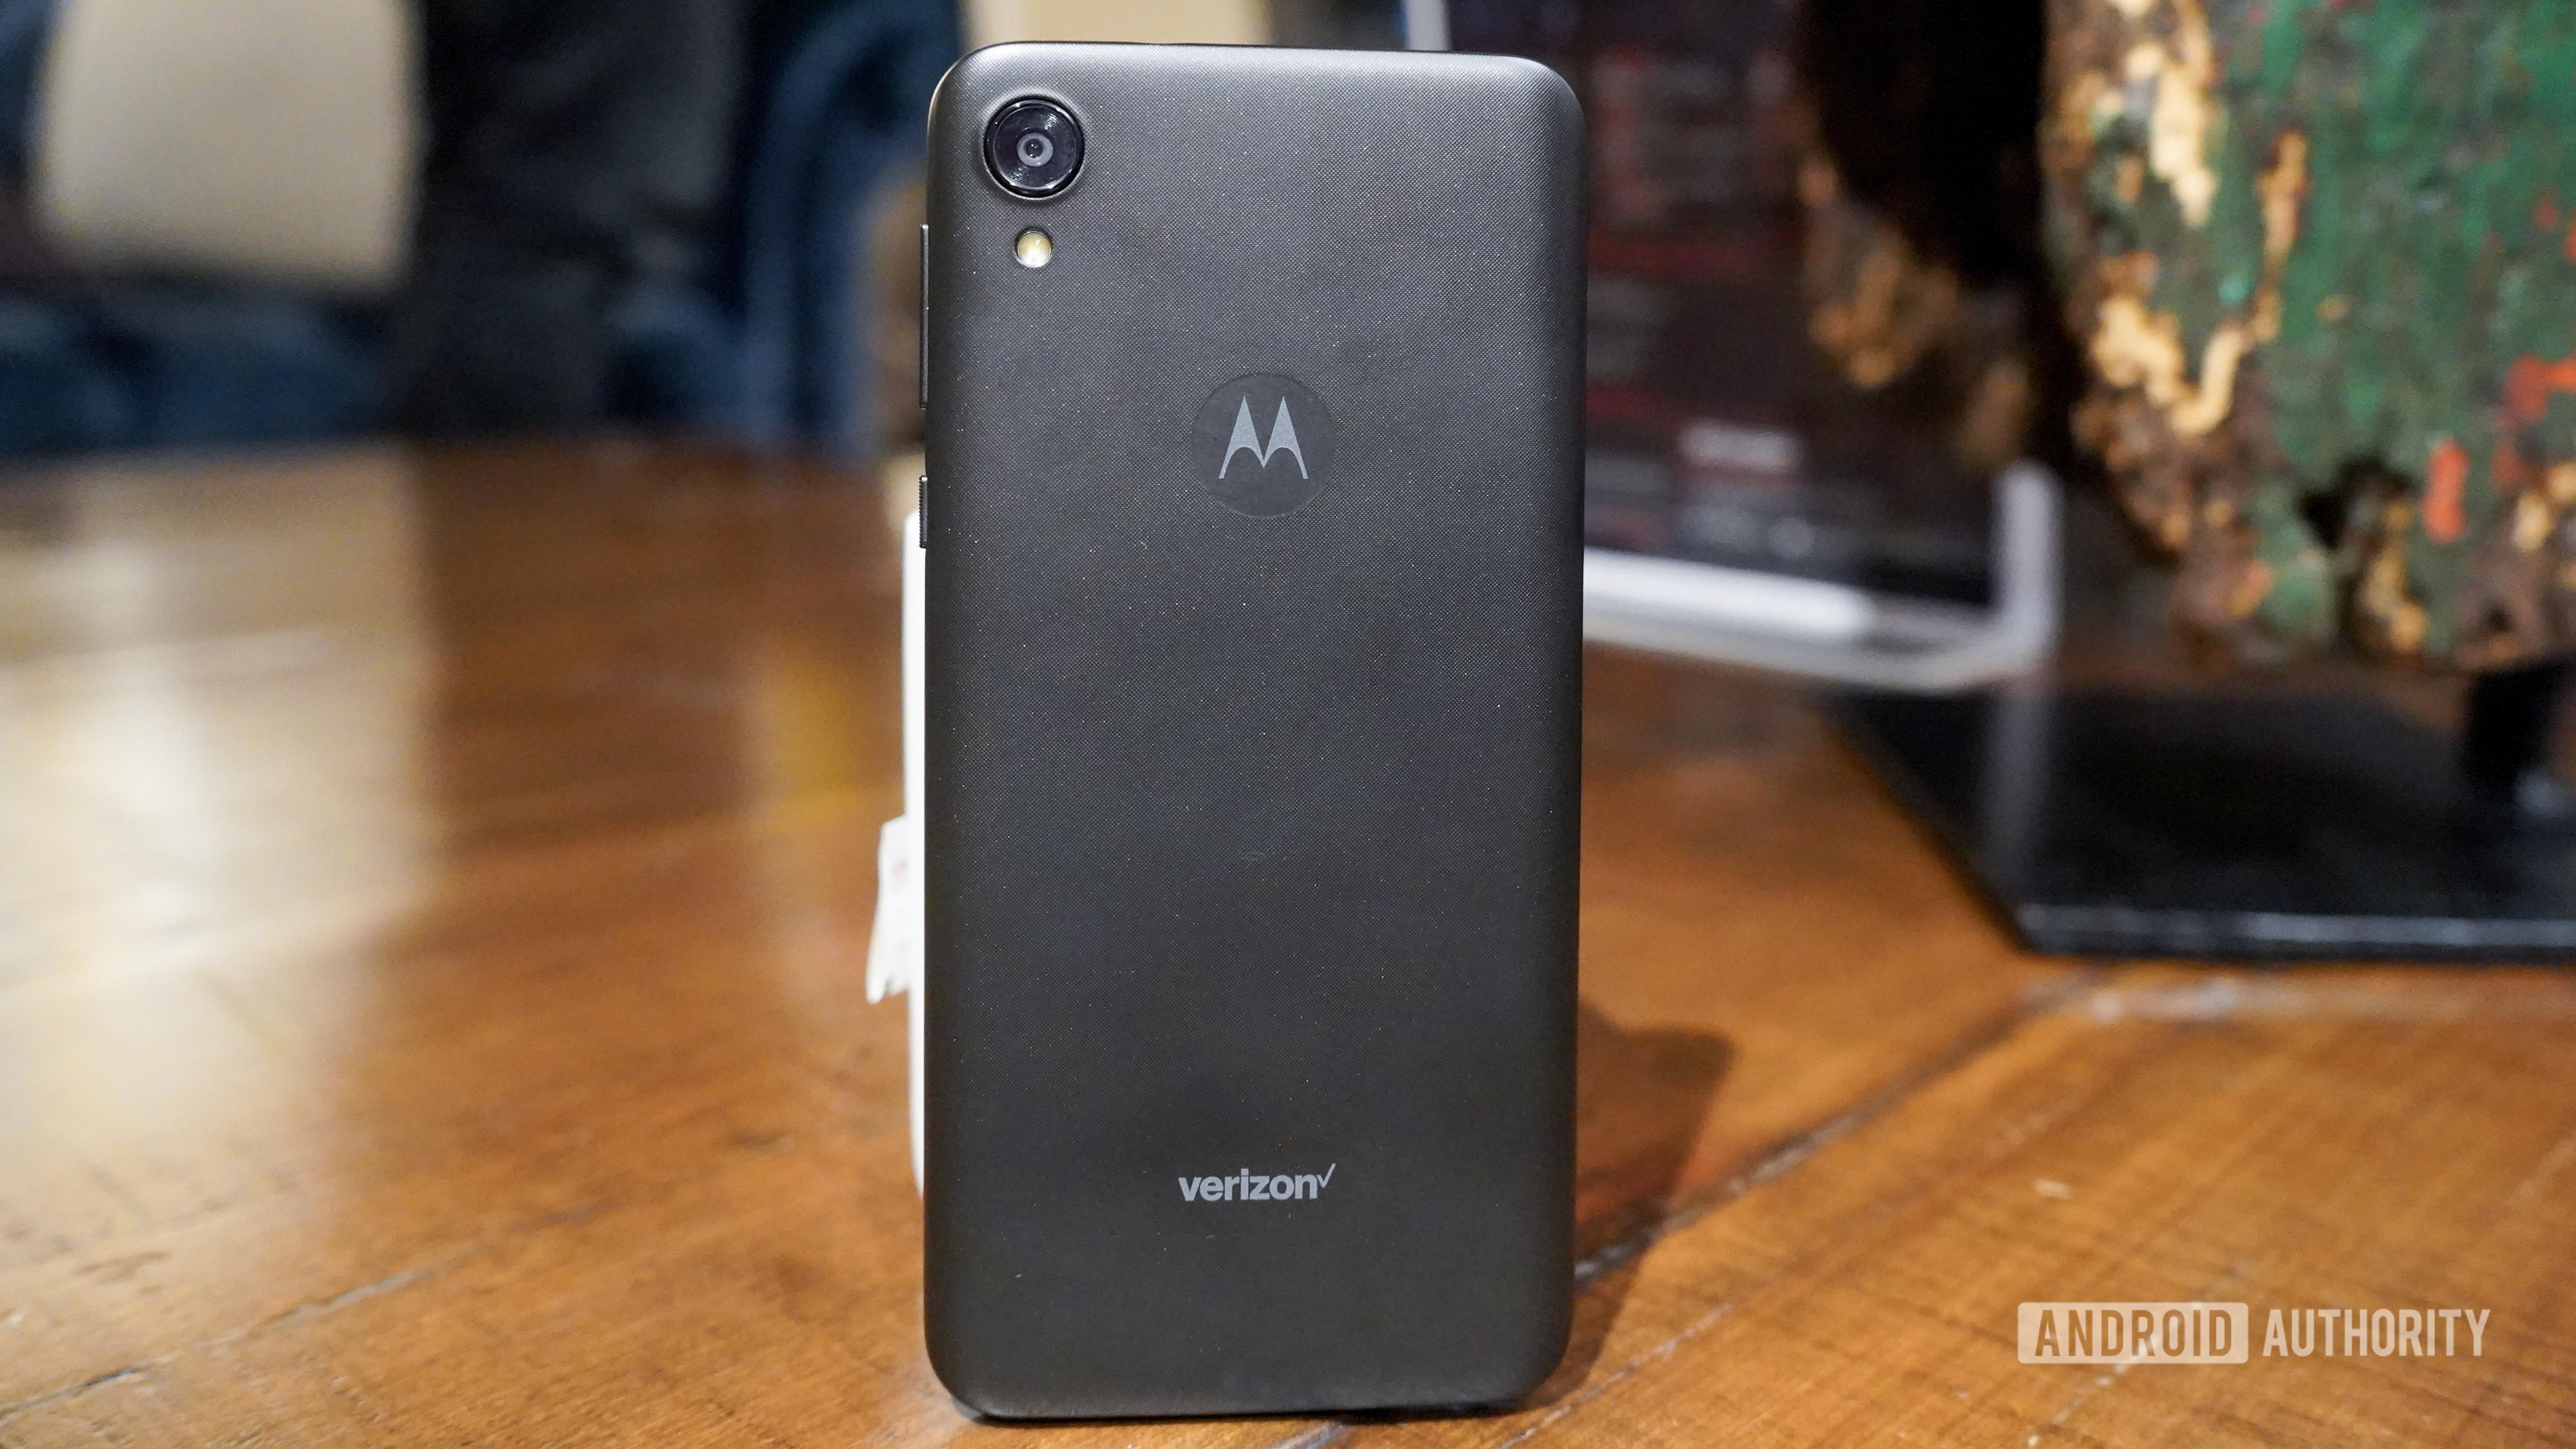 Motorola Moto E6 hands on leaning on mug